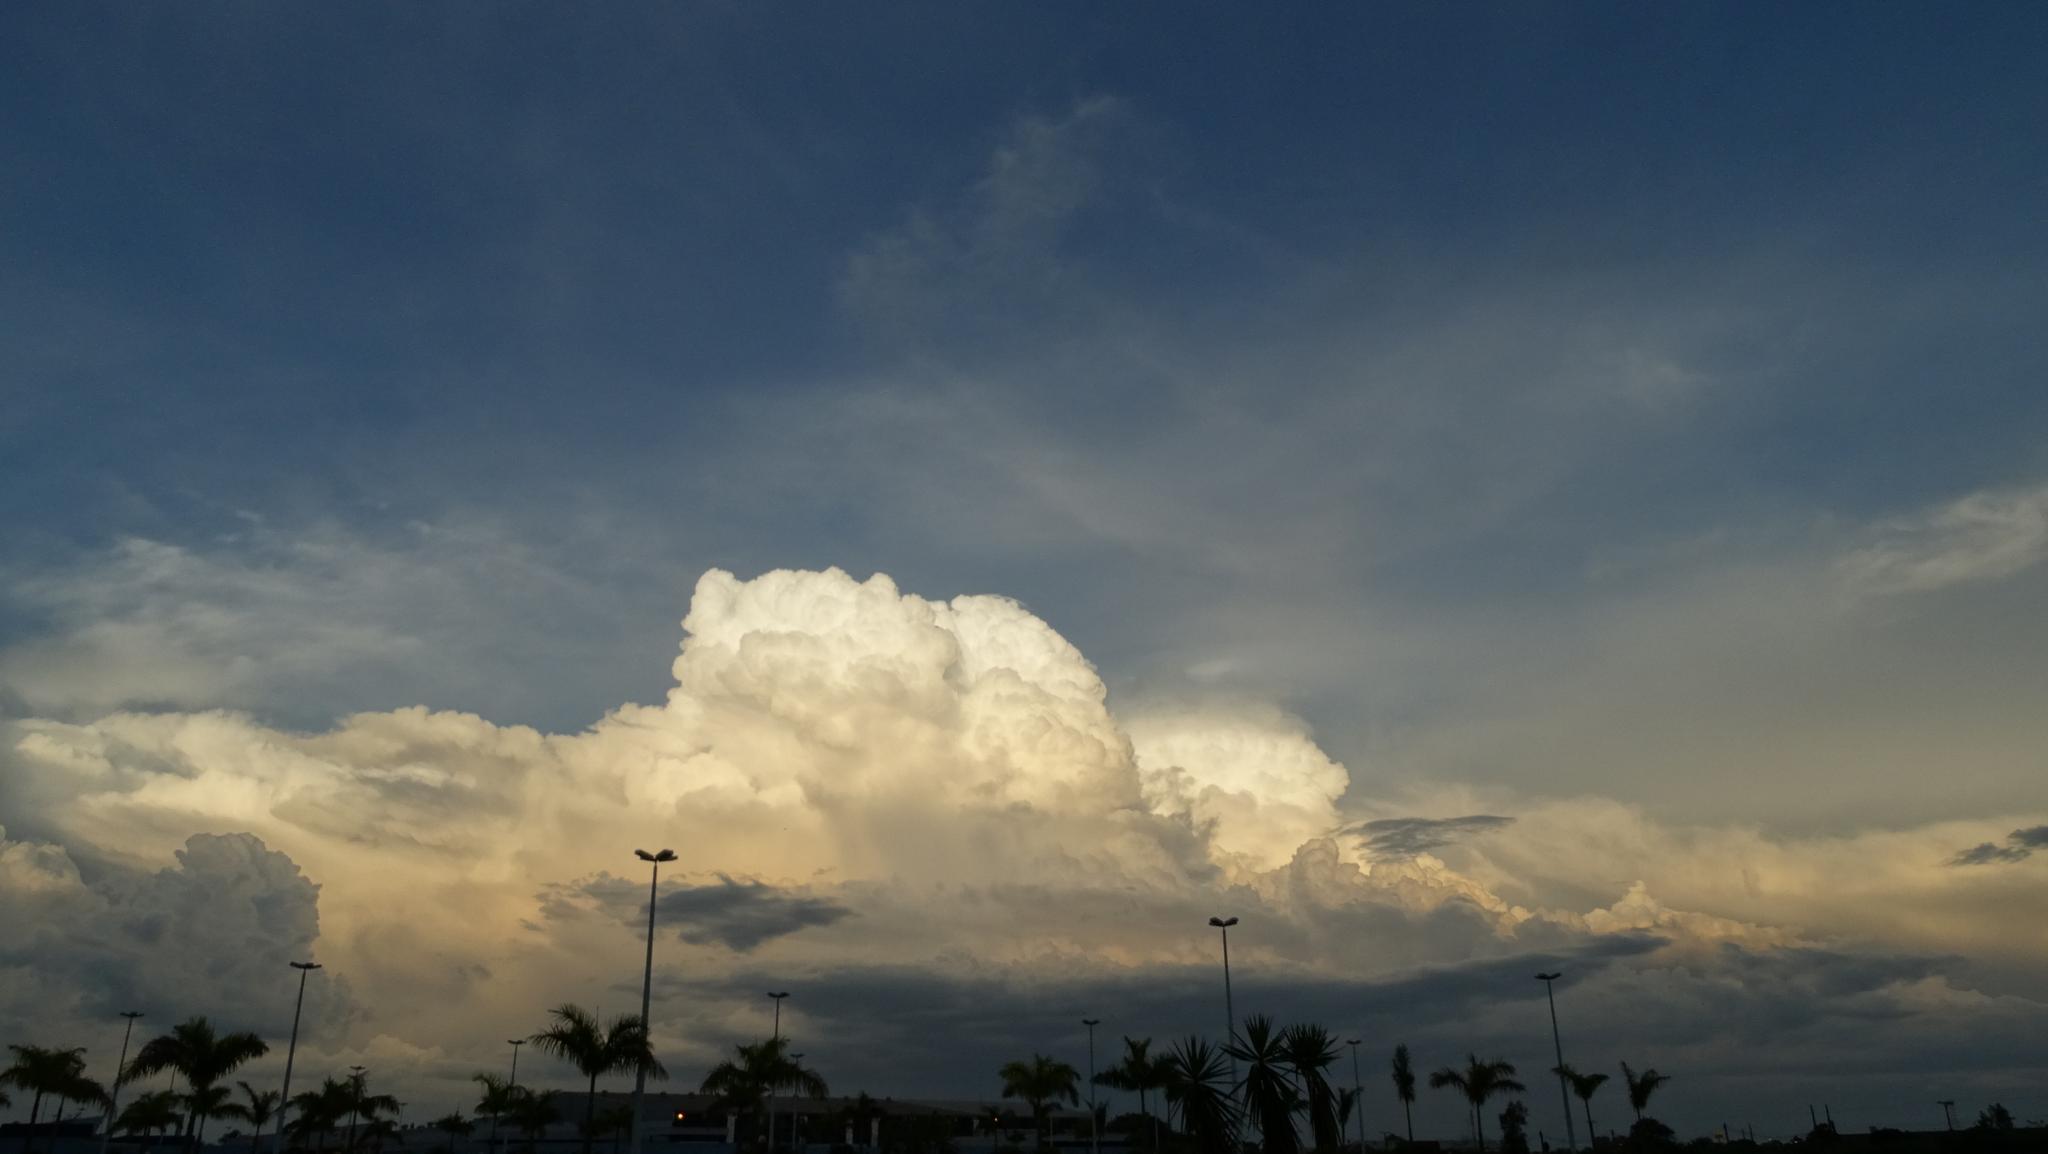 Tremenda nuvem!  by Thanattos